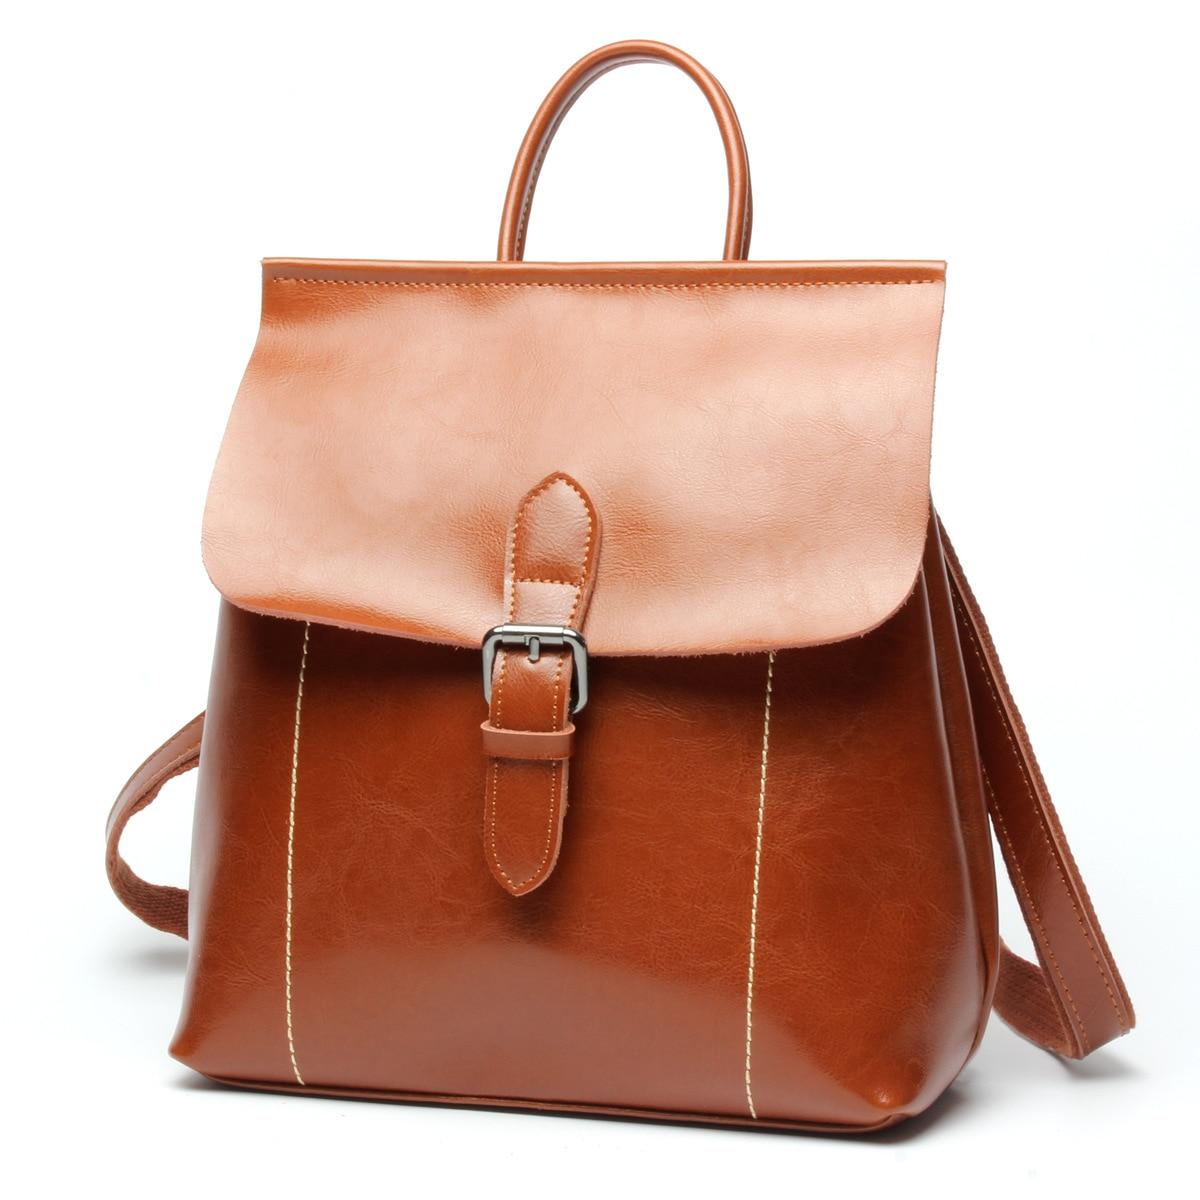 Leather Backpack School Bags Women Backpacks Women Casual Backpack Travel Bag High Quality Rucksack Bag